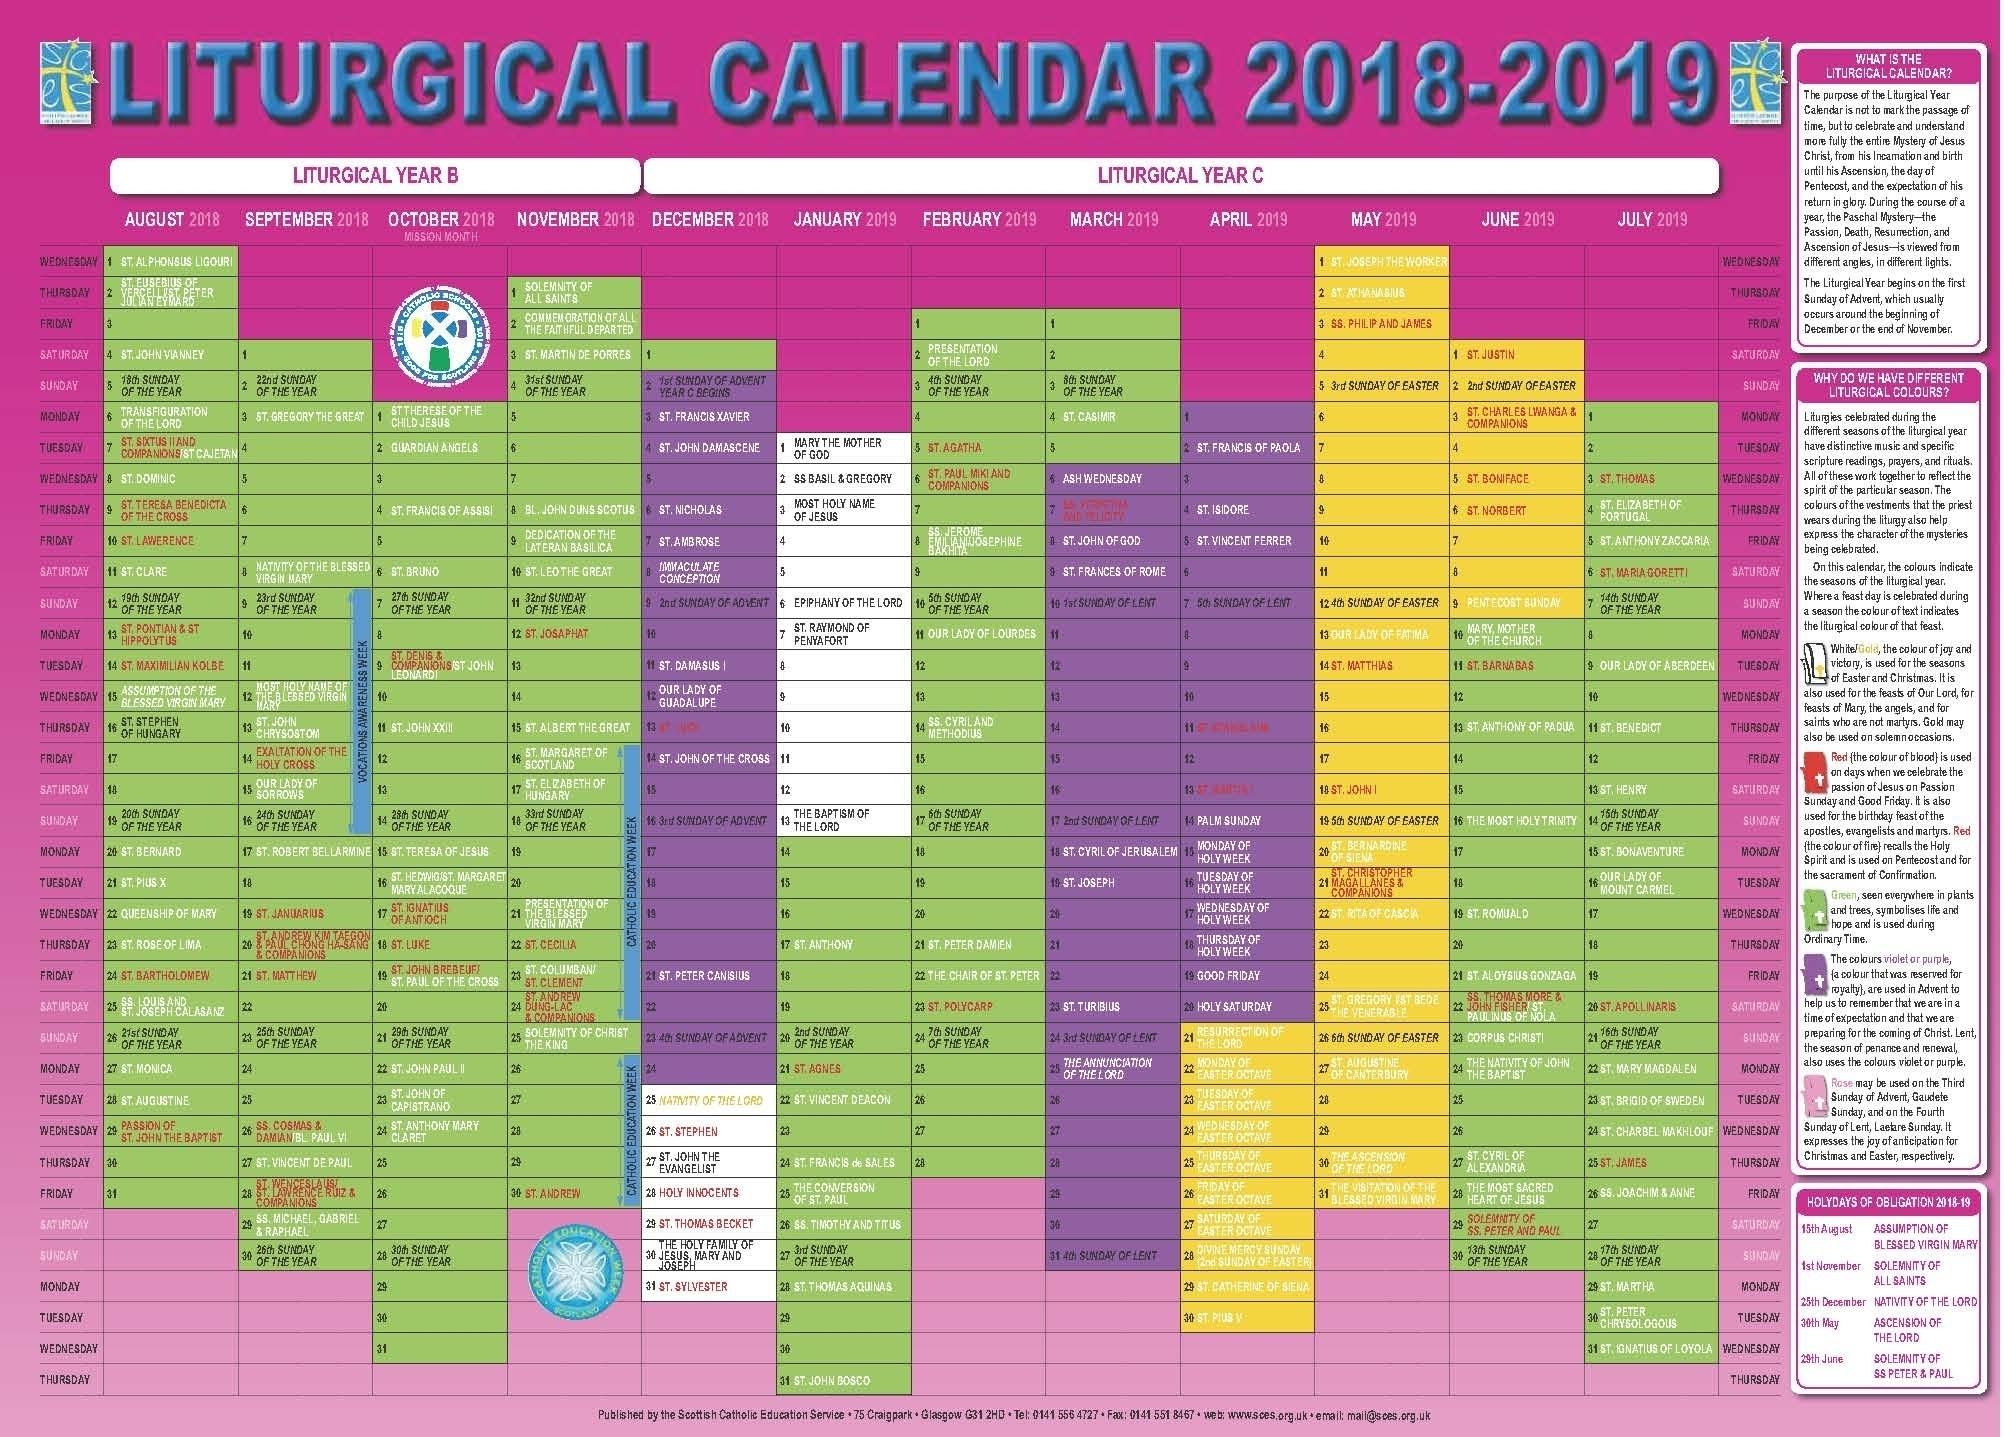 Catholic Liturgical Calendar 2020 Pdf - Calendar Inspiration within Printable Liturgical Calendar 2019 2020